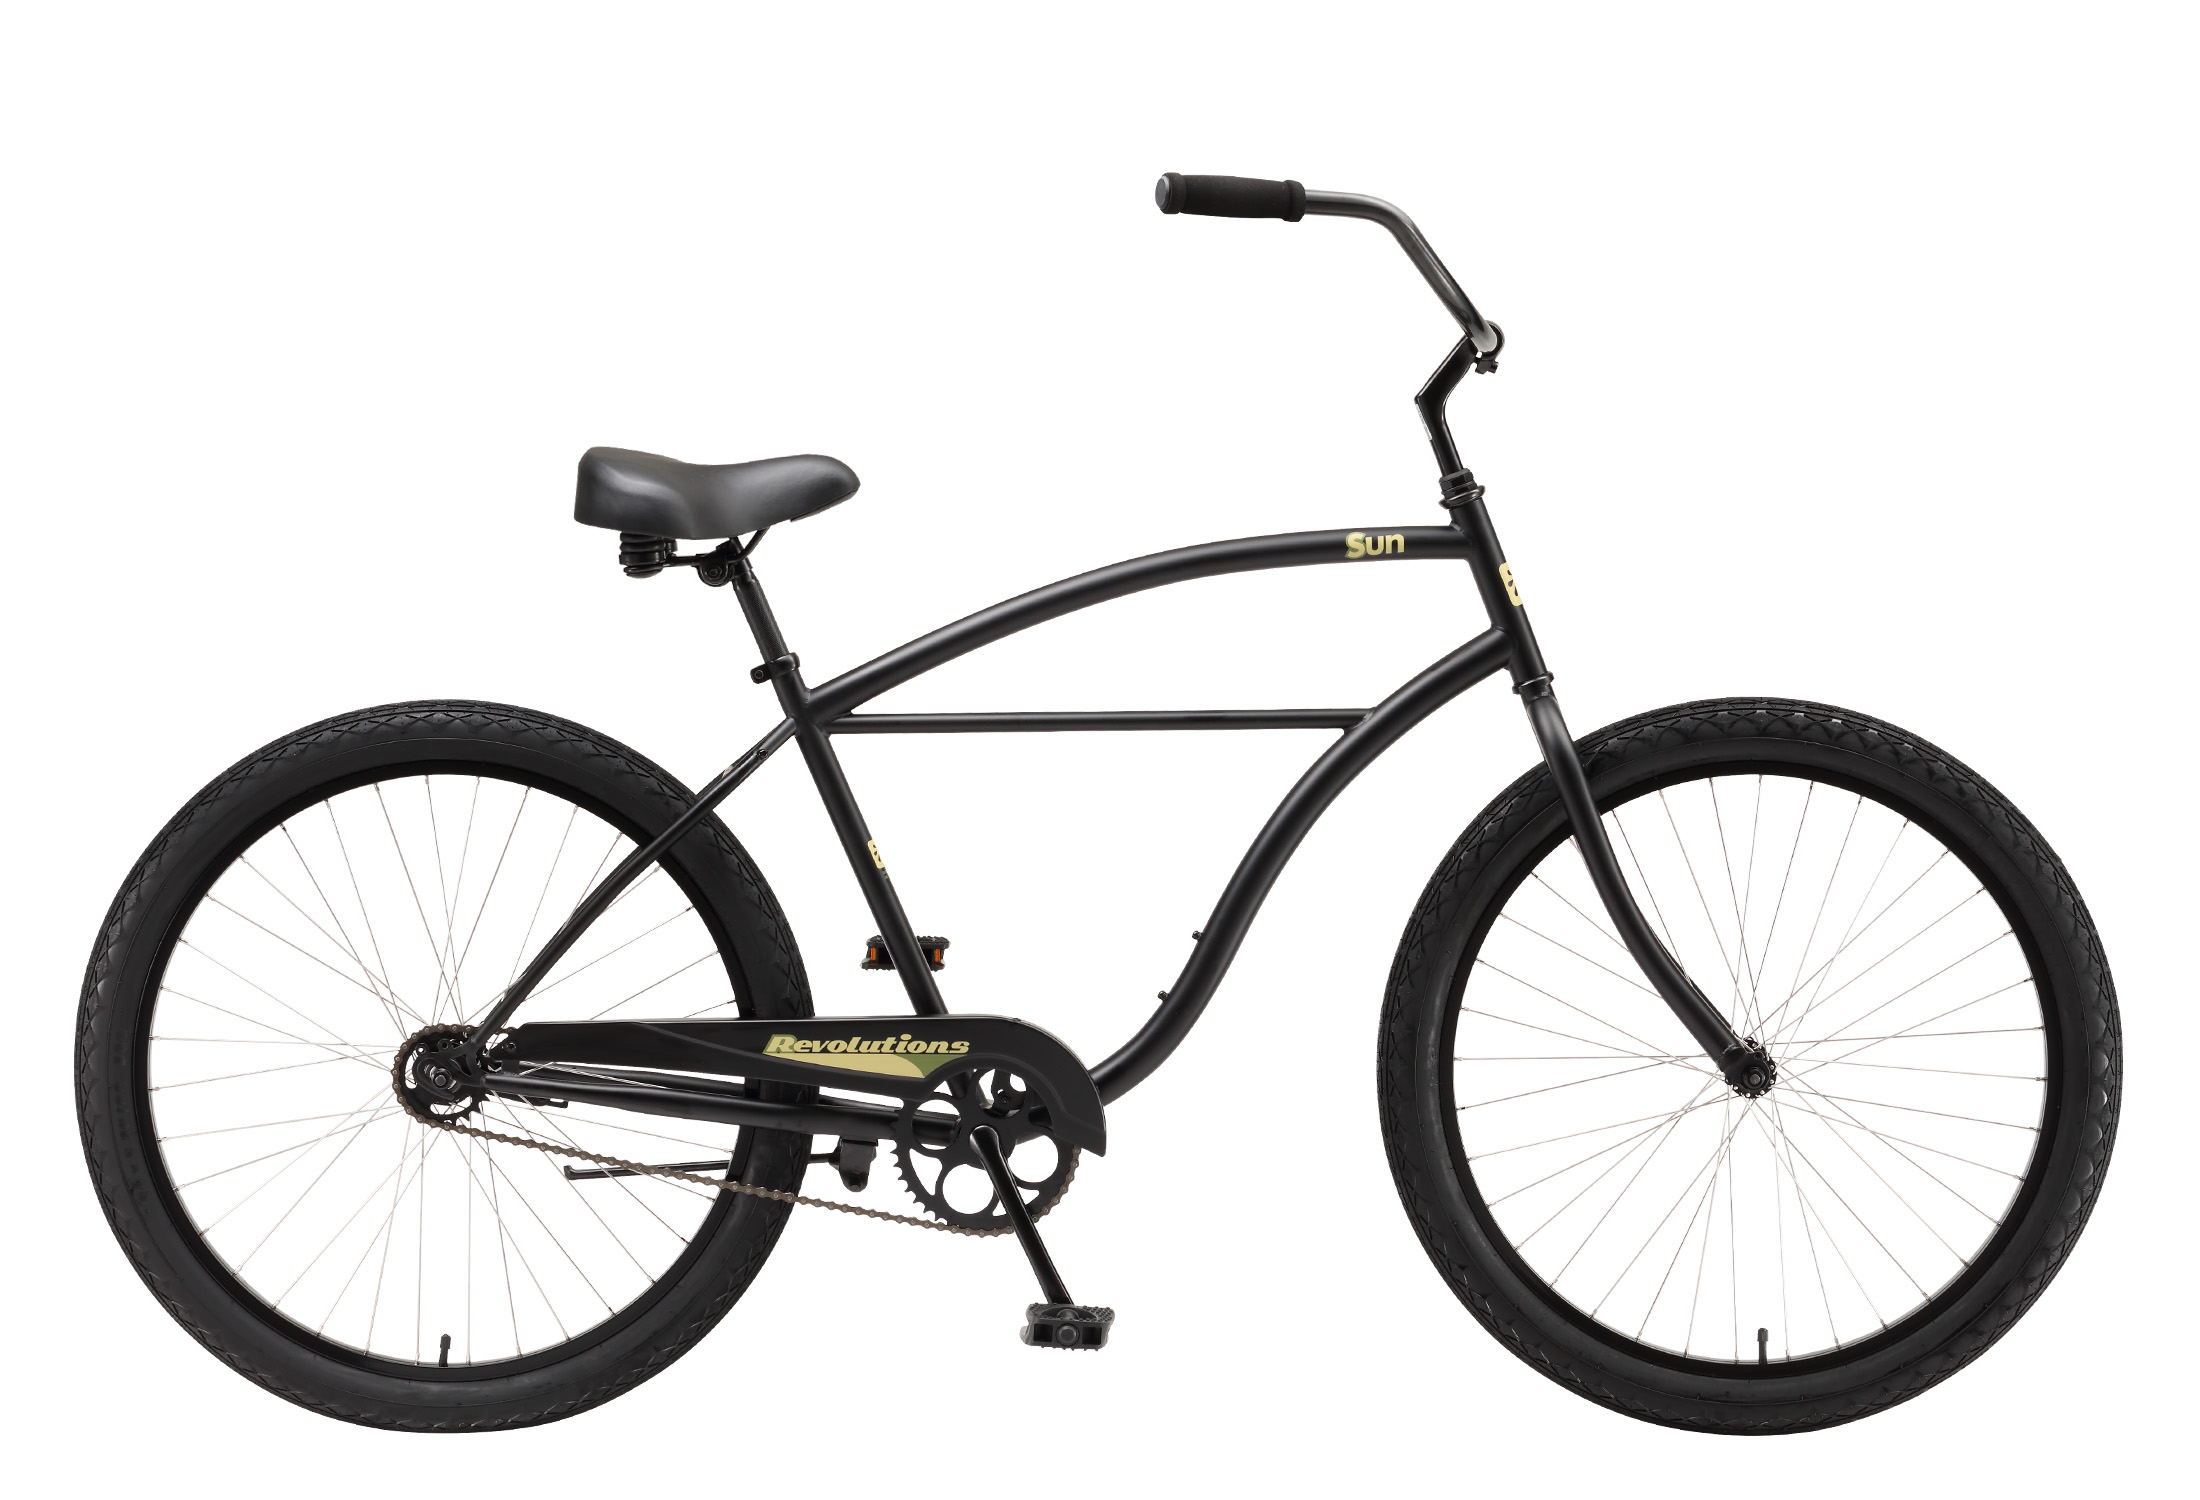 Revolutions Bike Categories Sun Bicycles